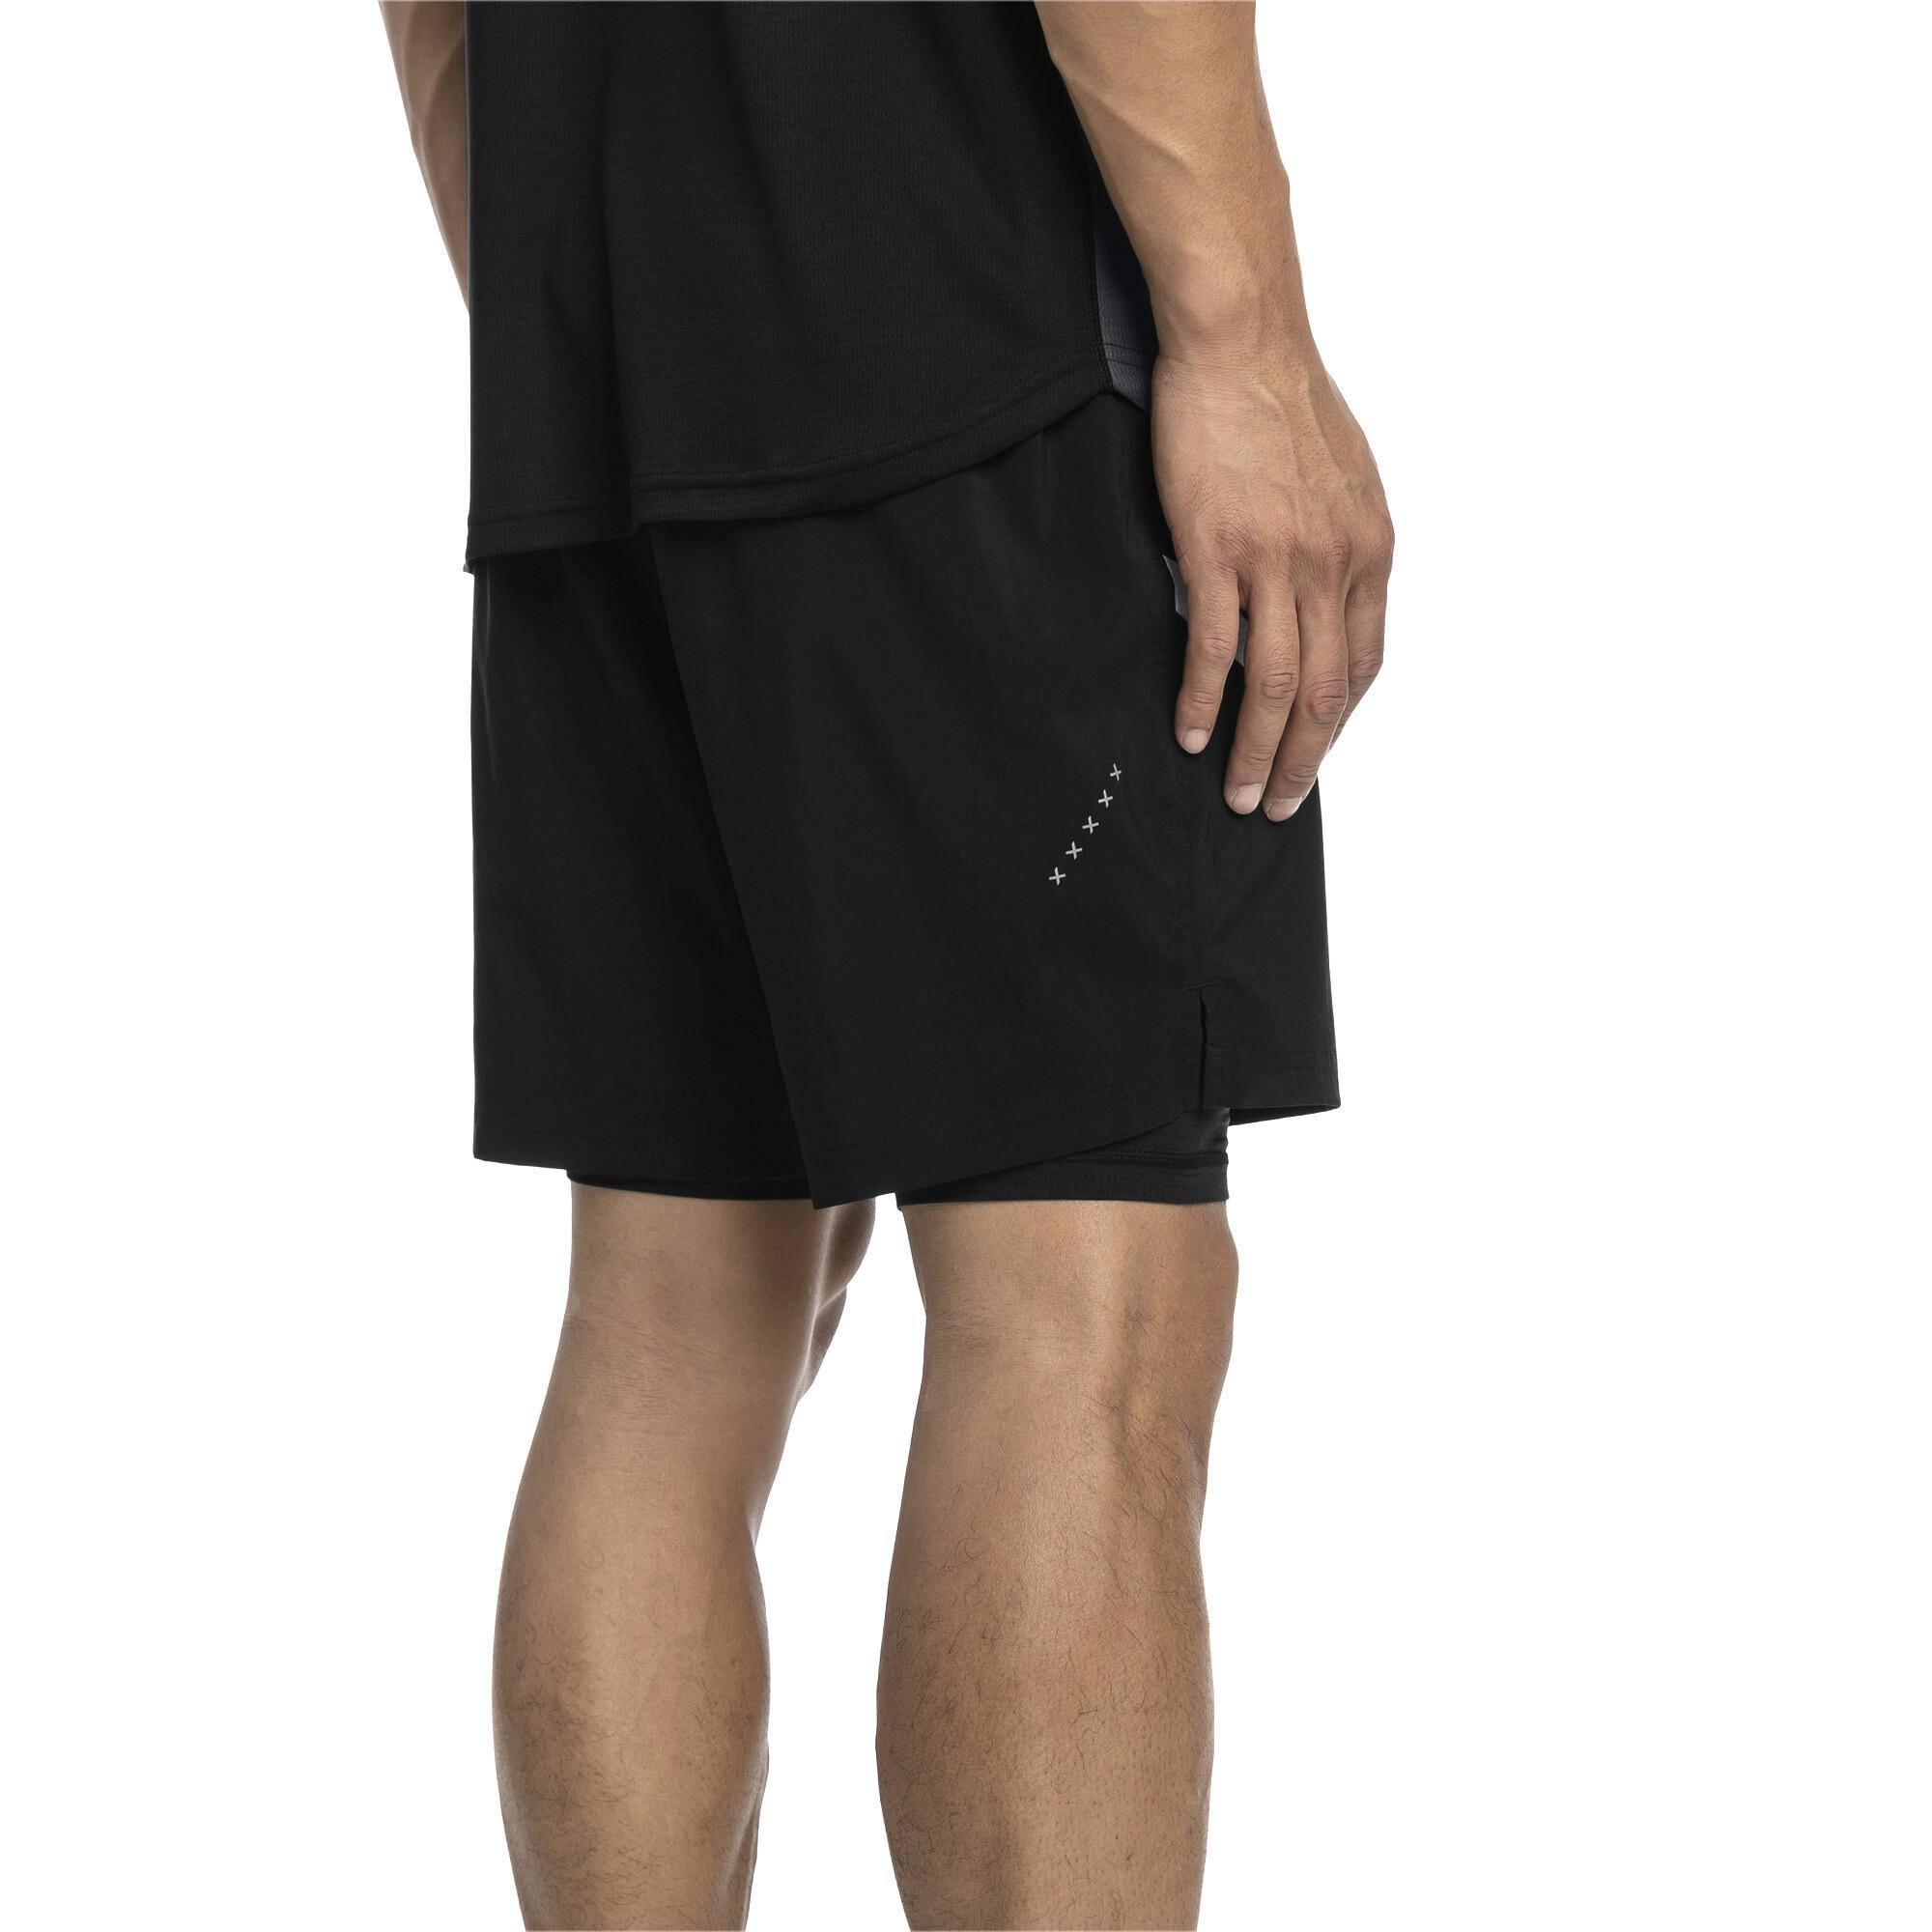 Image Puma Ignite Woven 2 in 1 Men's Running Shorts #2